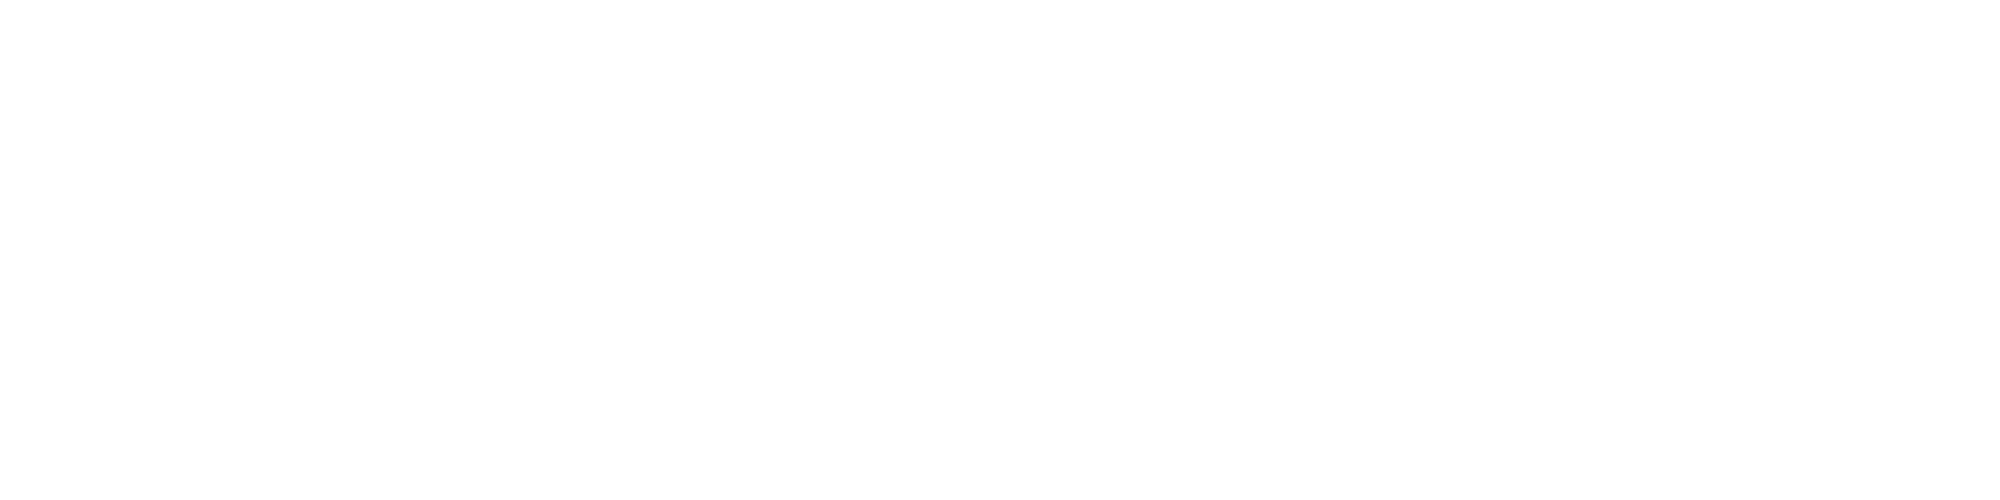 Vox-ELectronics-Baileys-Audio-Lake-Charles-Louisiana-Audio-Services